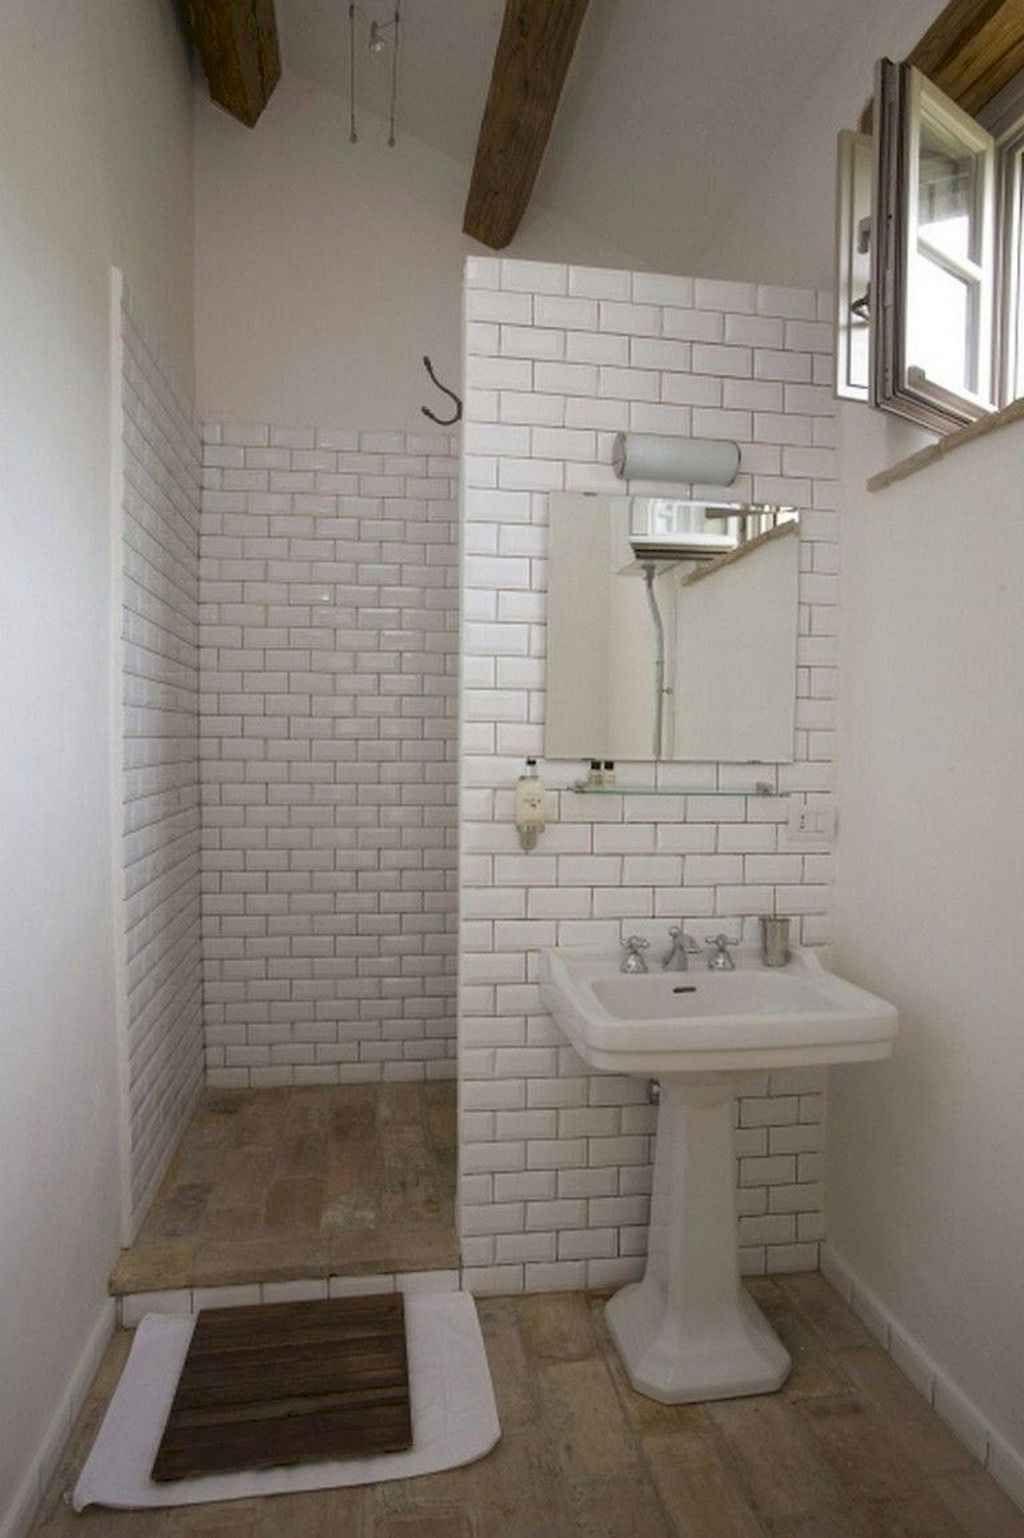 70 Genius Tiny House Bathroom Shower Design Ideas Homespecially Tiny House Bathroom Bathroom Interior Design Bathroom Design